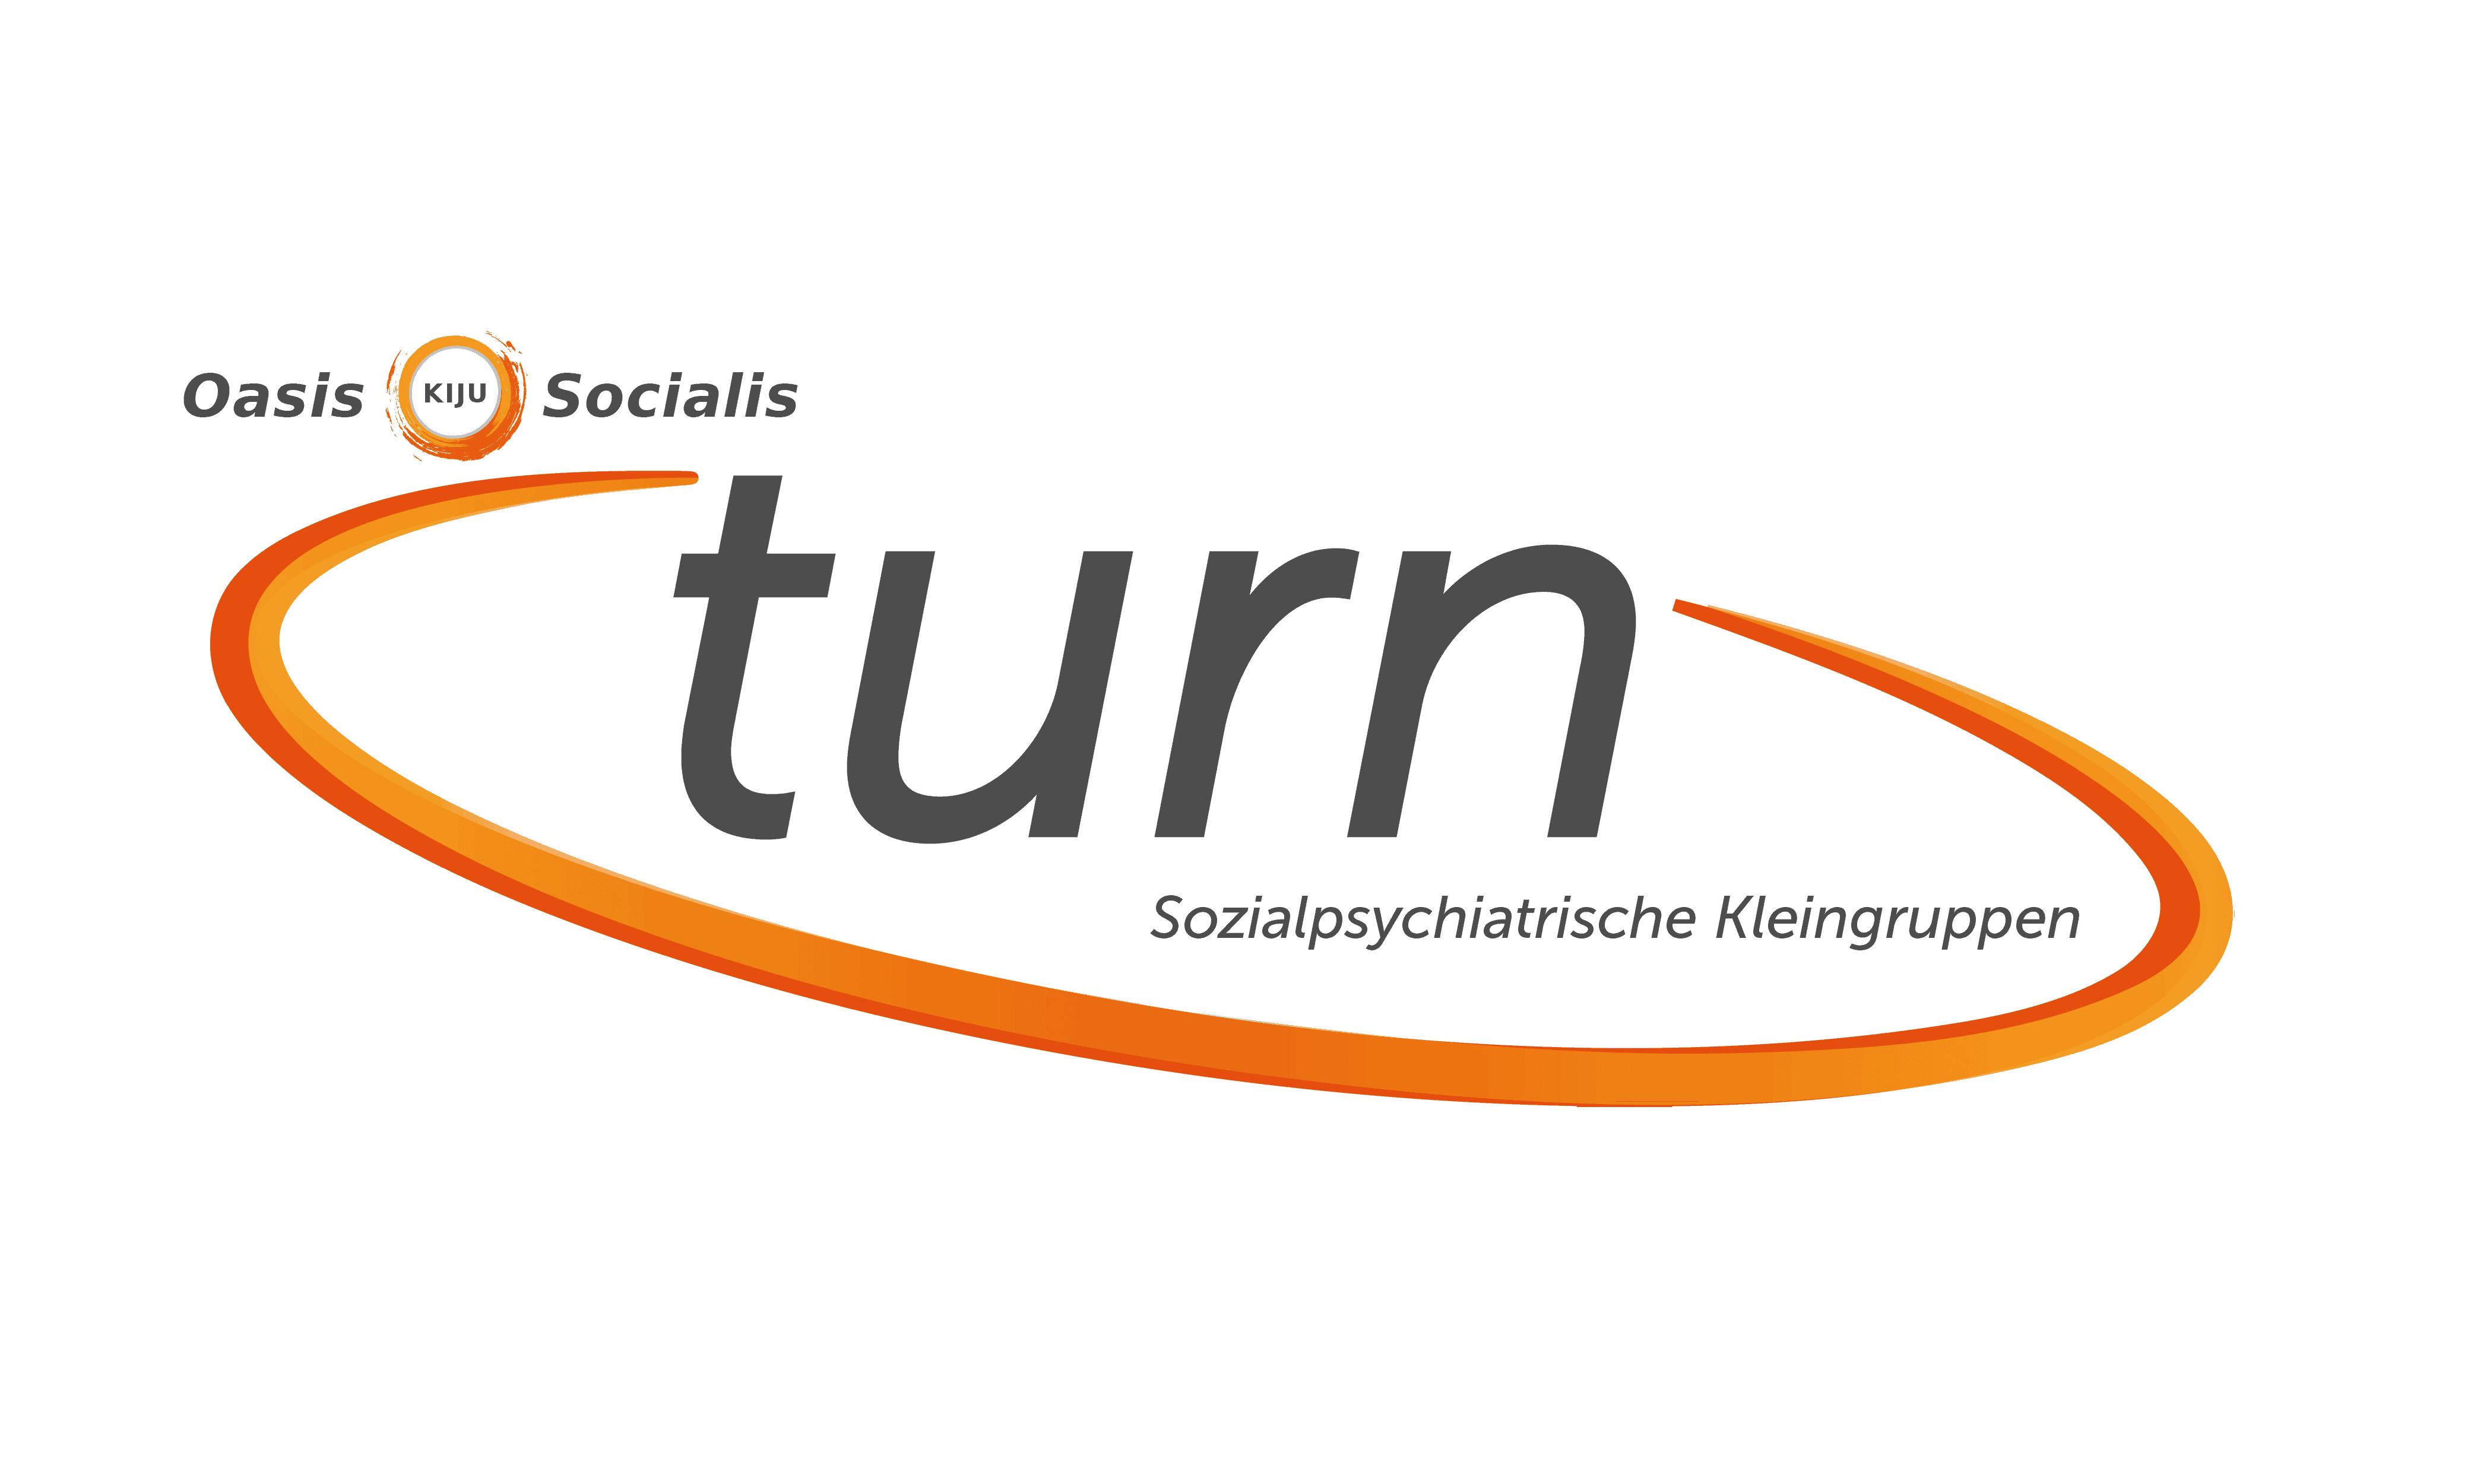 Oasis SocialisKiJu gem. GmbH